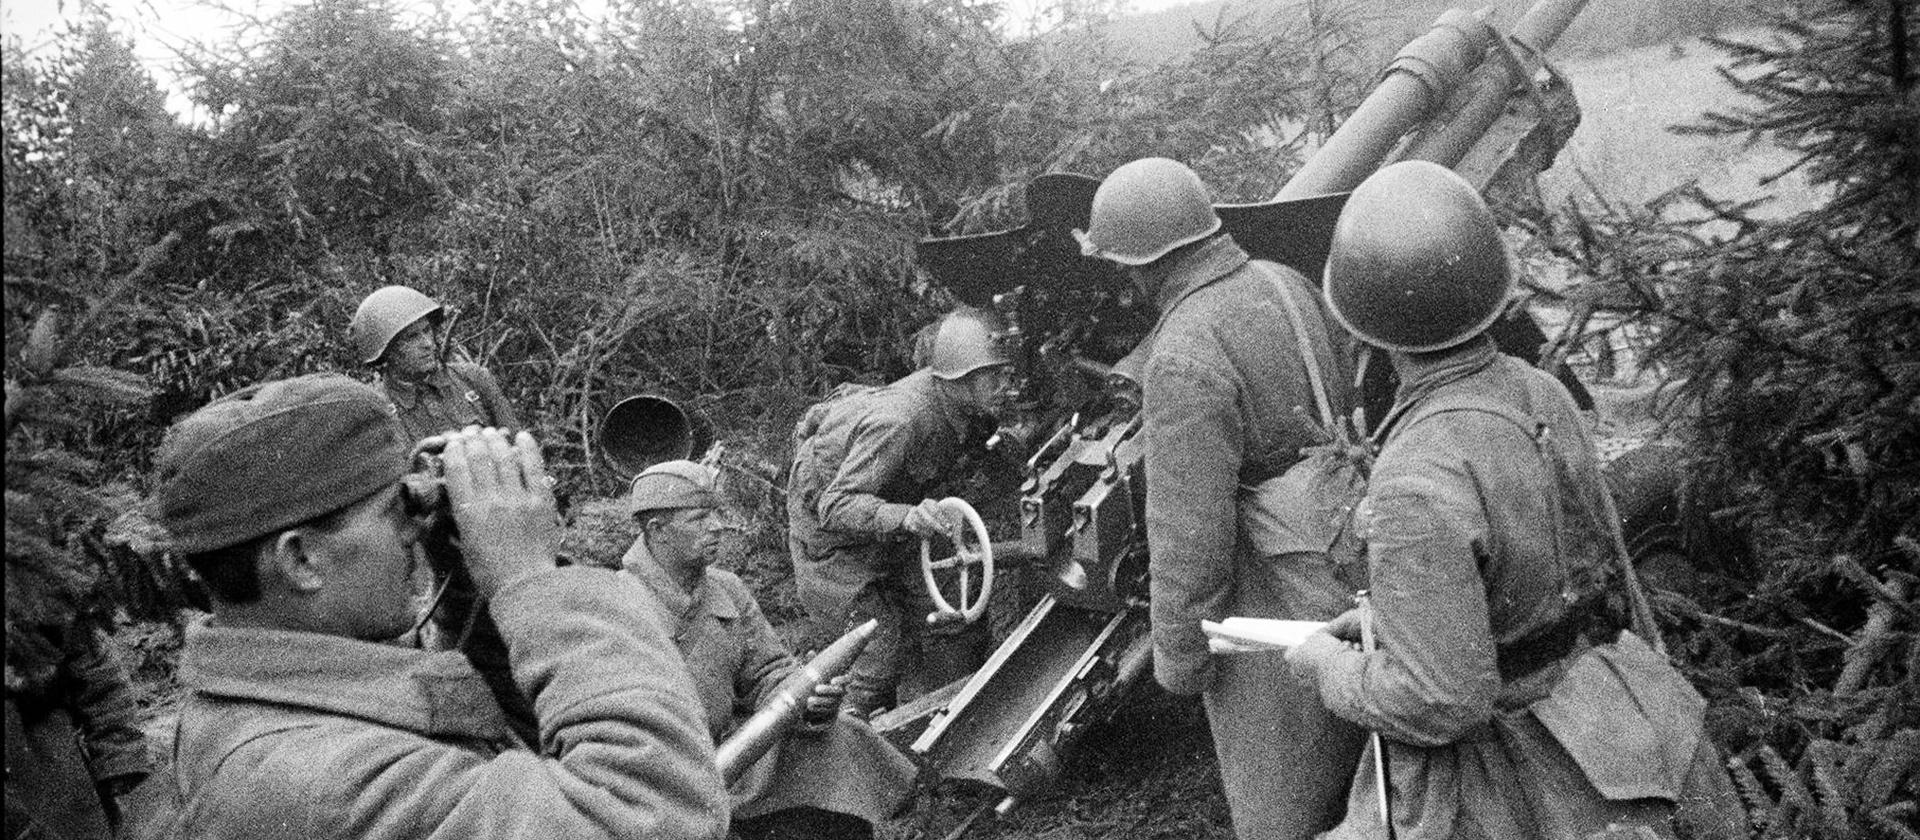 Три «Славы» полкового артиллериста